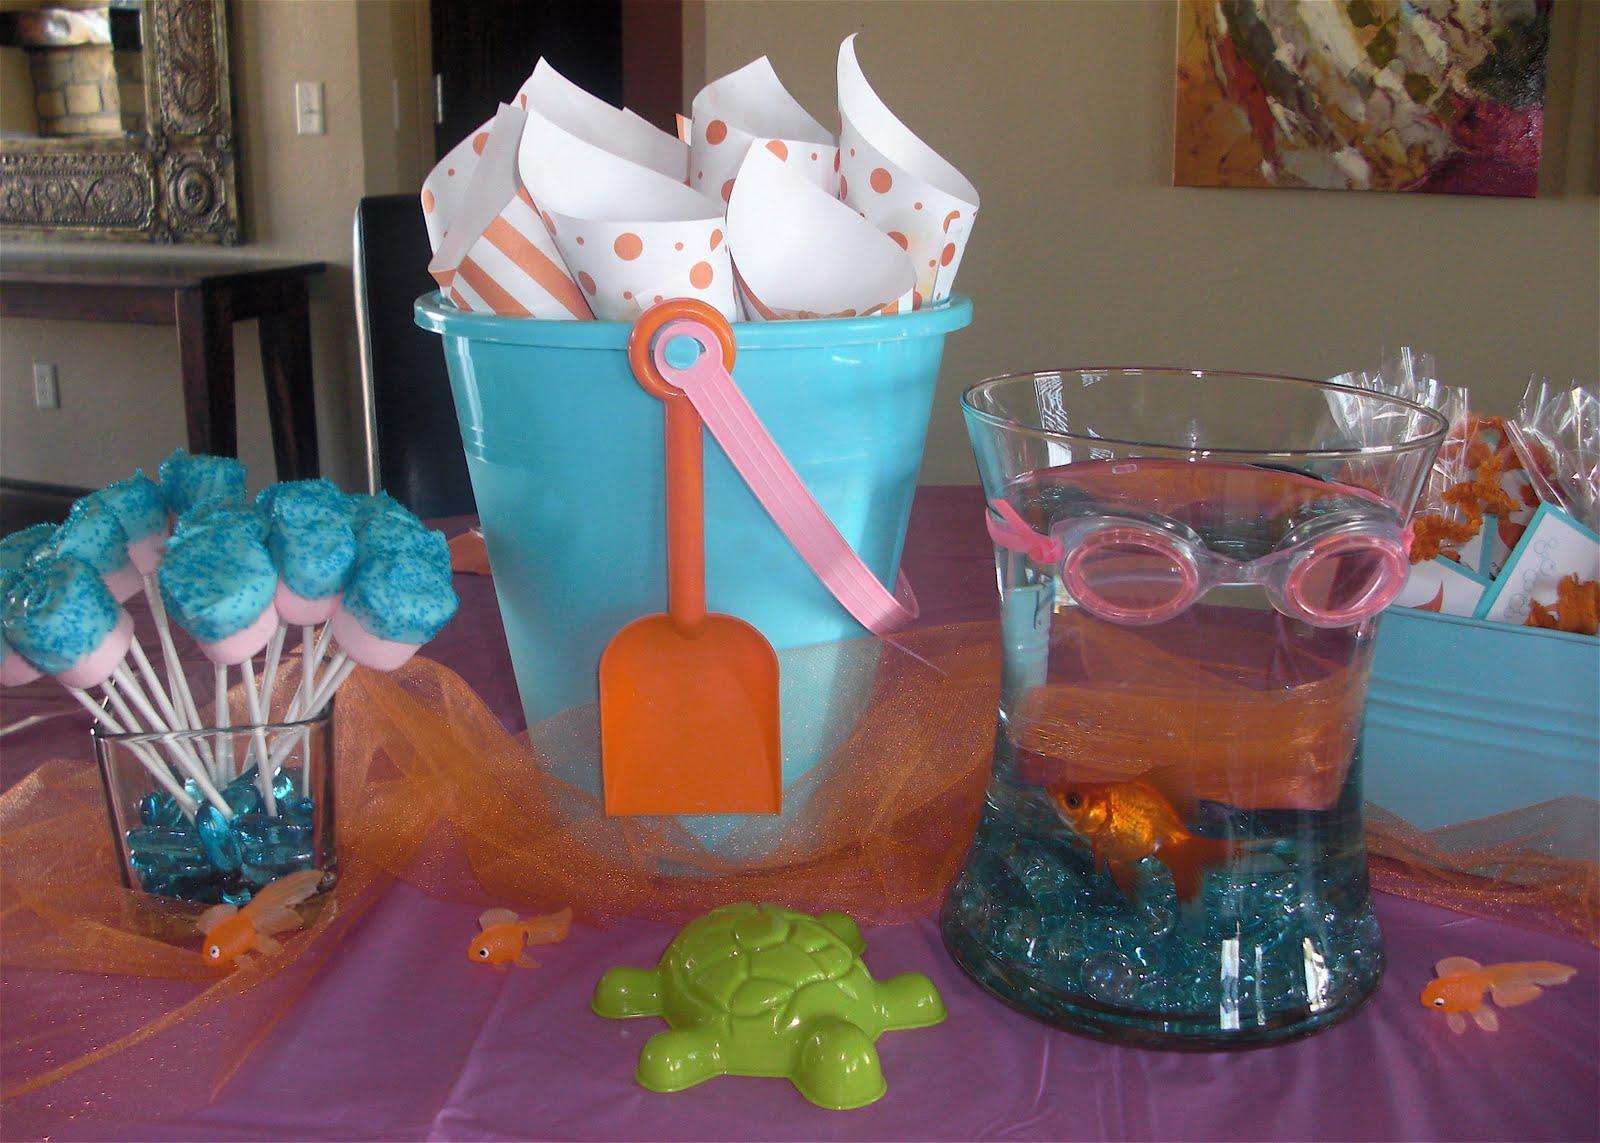 Goldfish Birthday Decorations Image Inspiration of Cake and